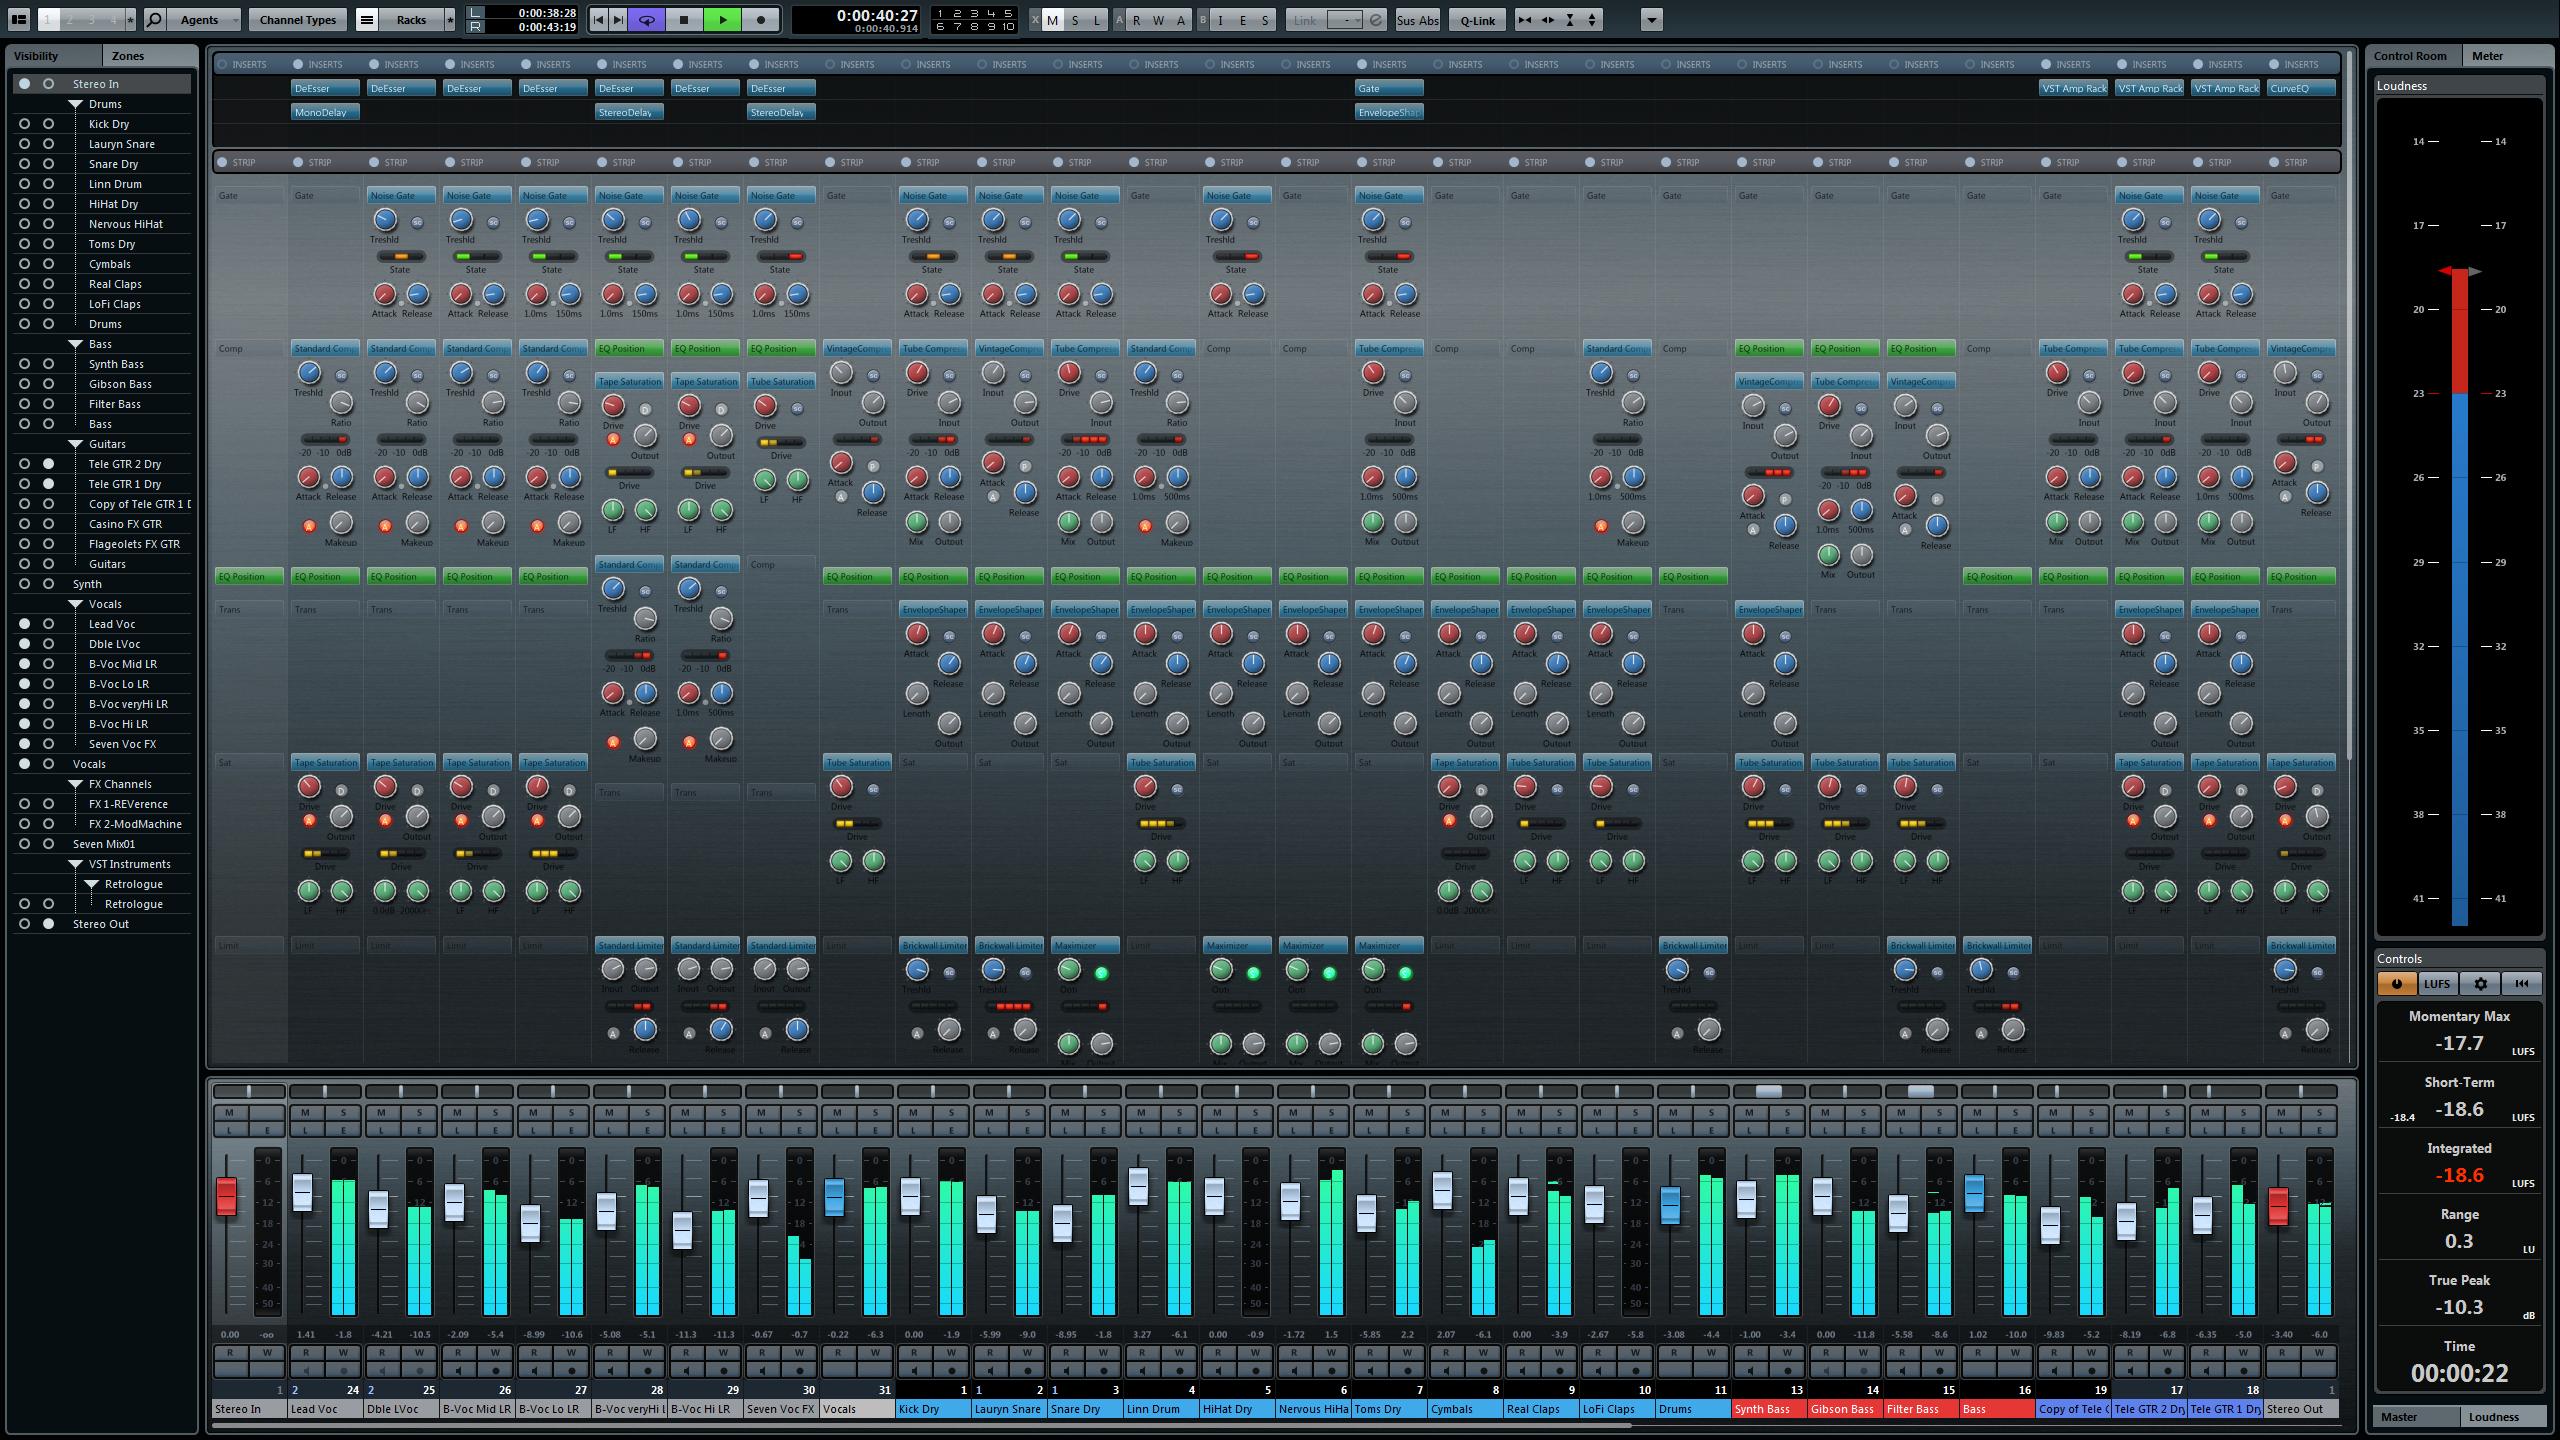 Cubase 7 Mixing console